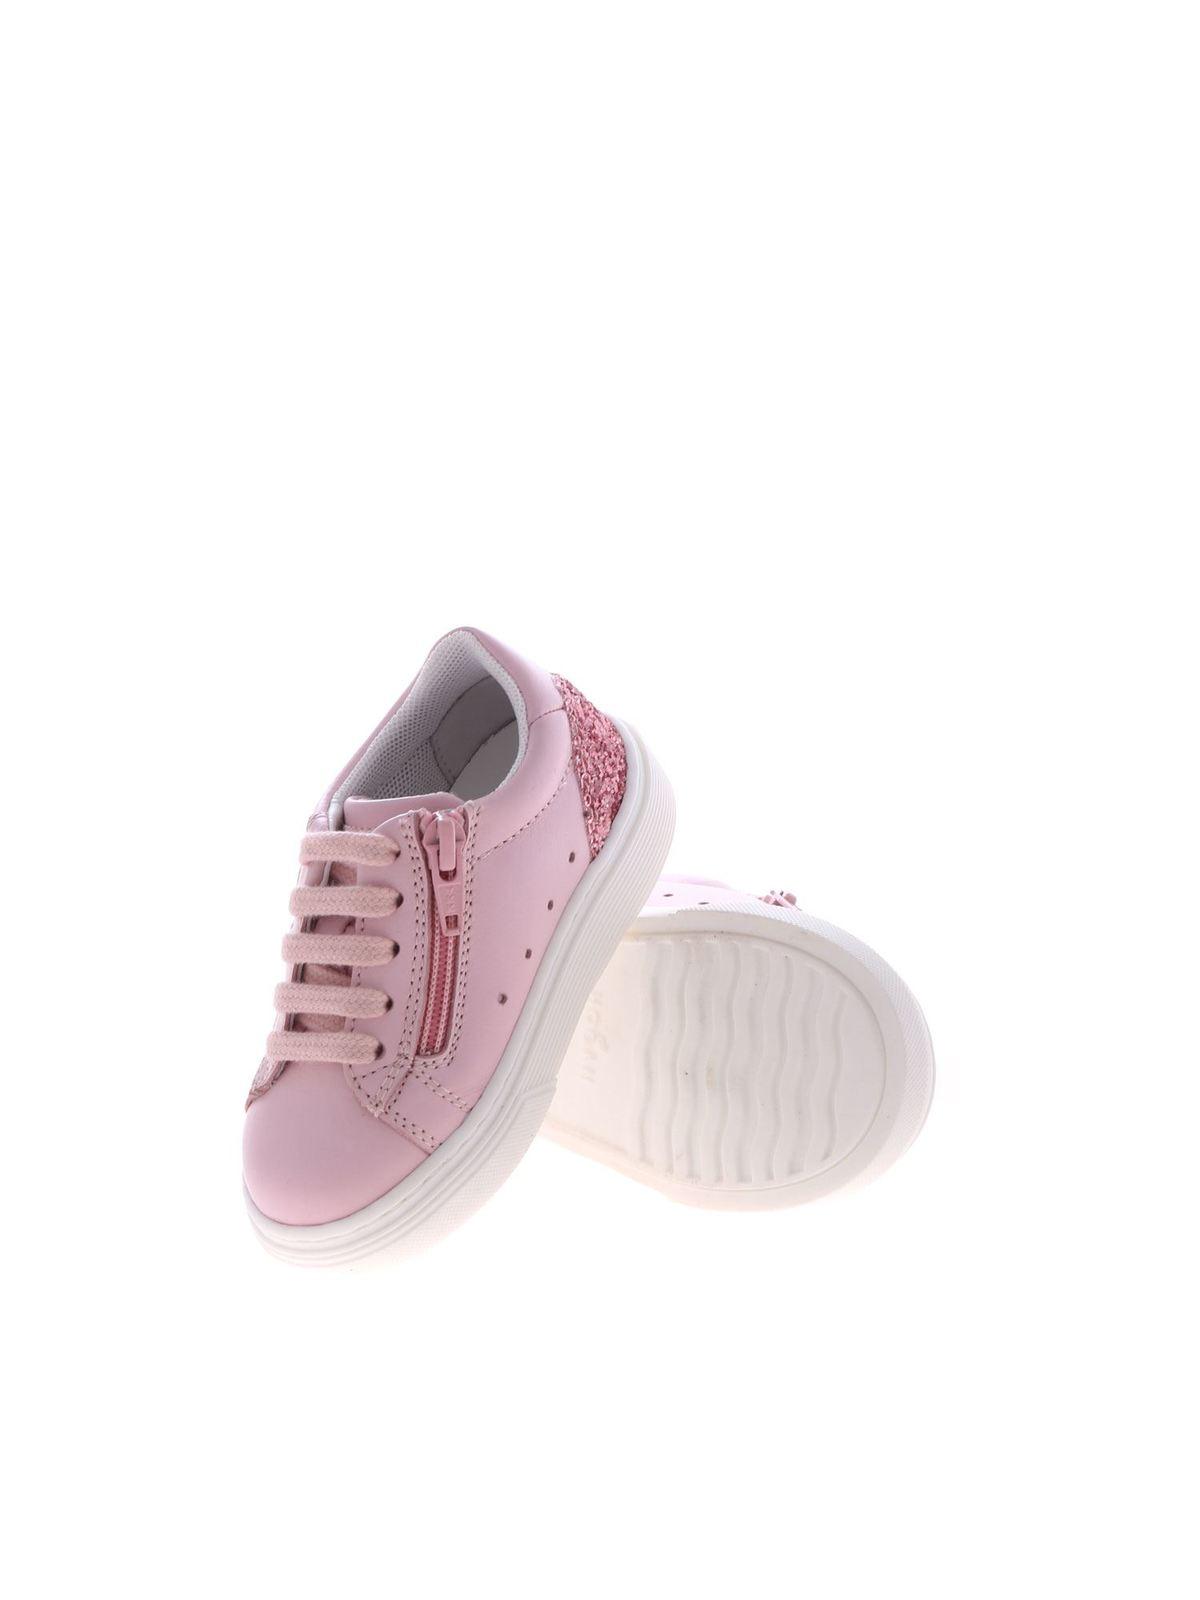 Sneakers Hogan Junior - Sneakers J340 rosa con glitter ...